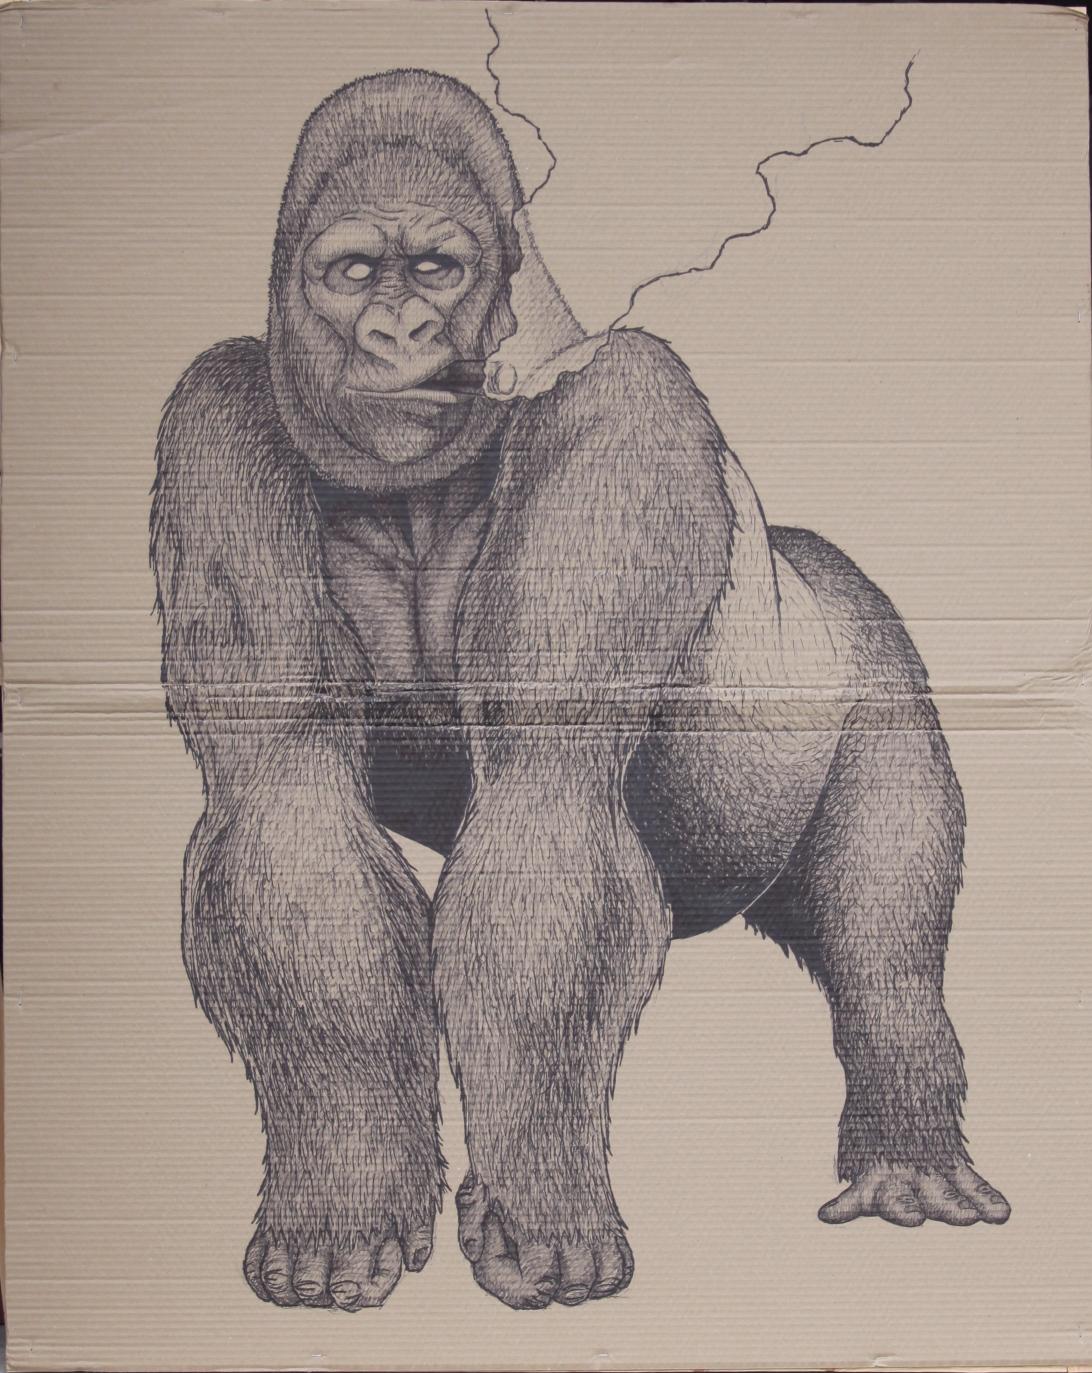 Gorilla with Cigar   2015  Sharpie on cardboard  48x60